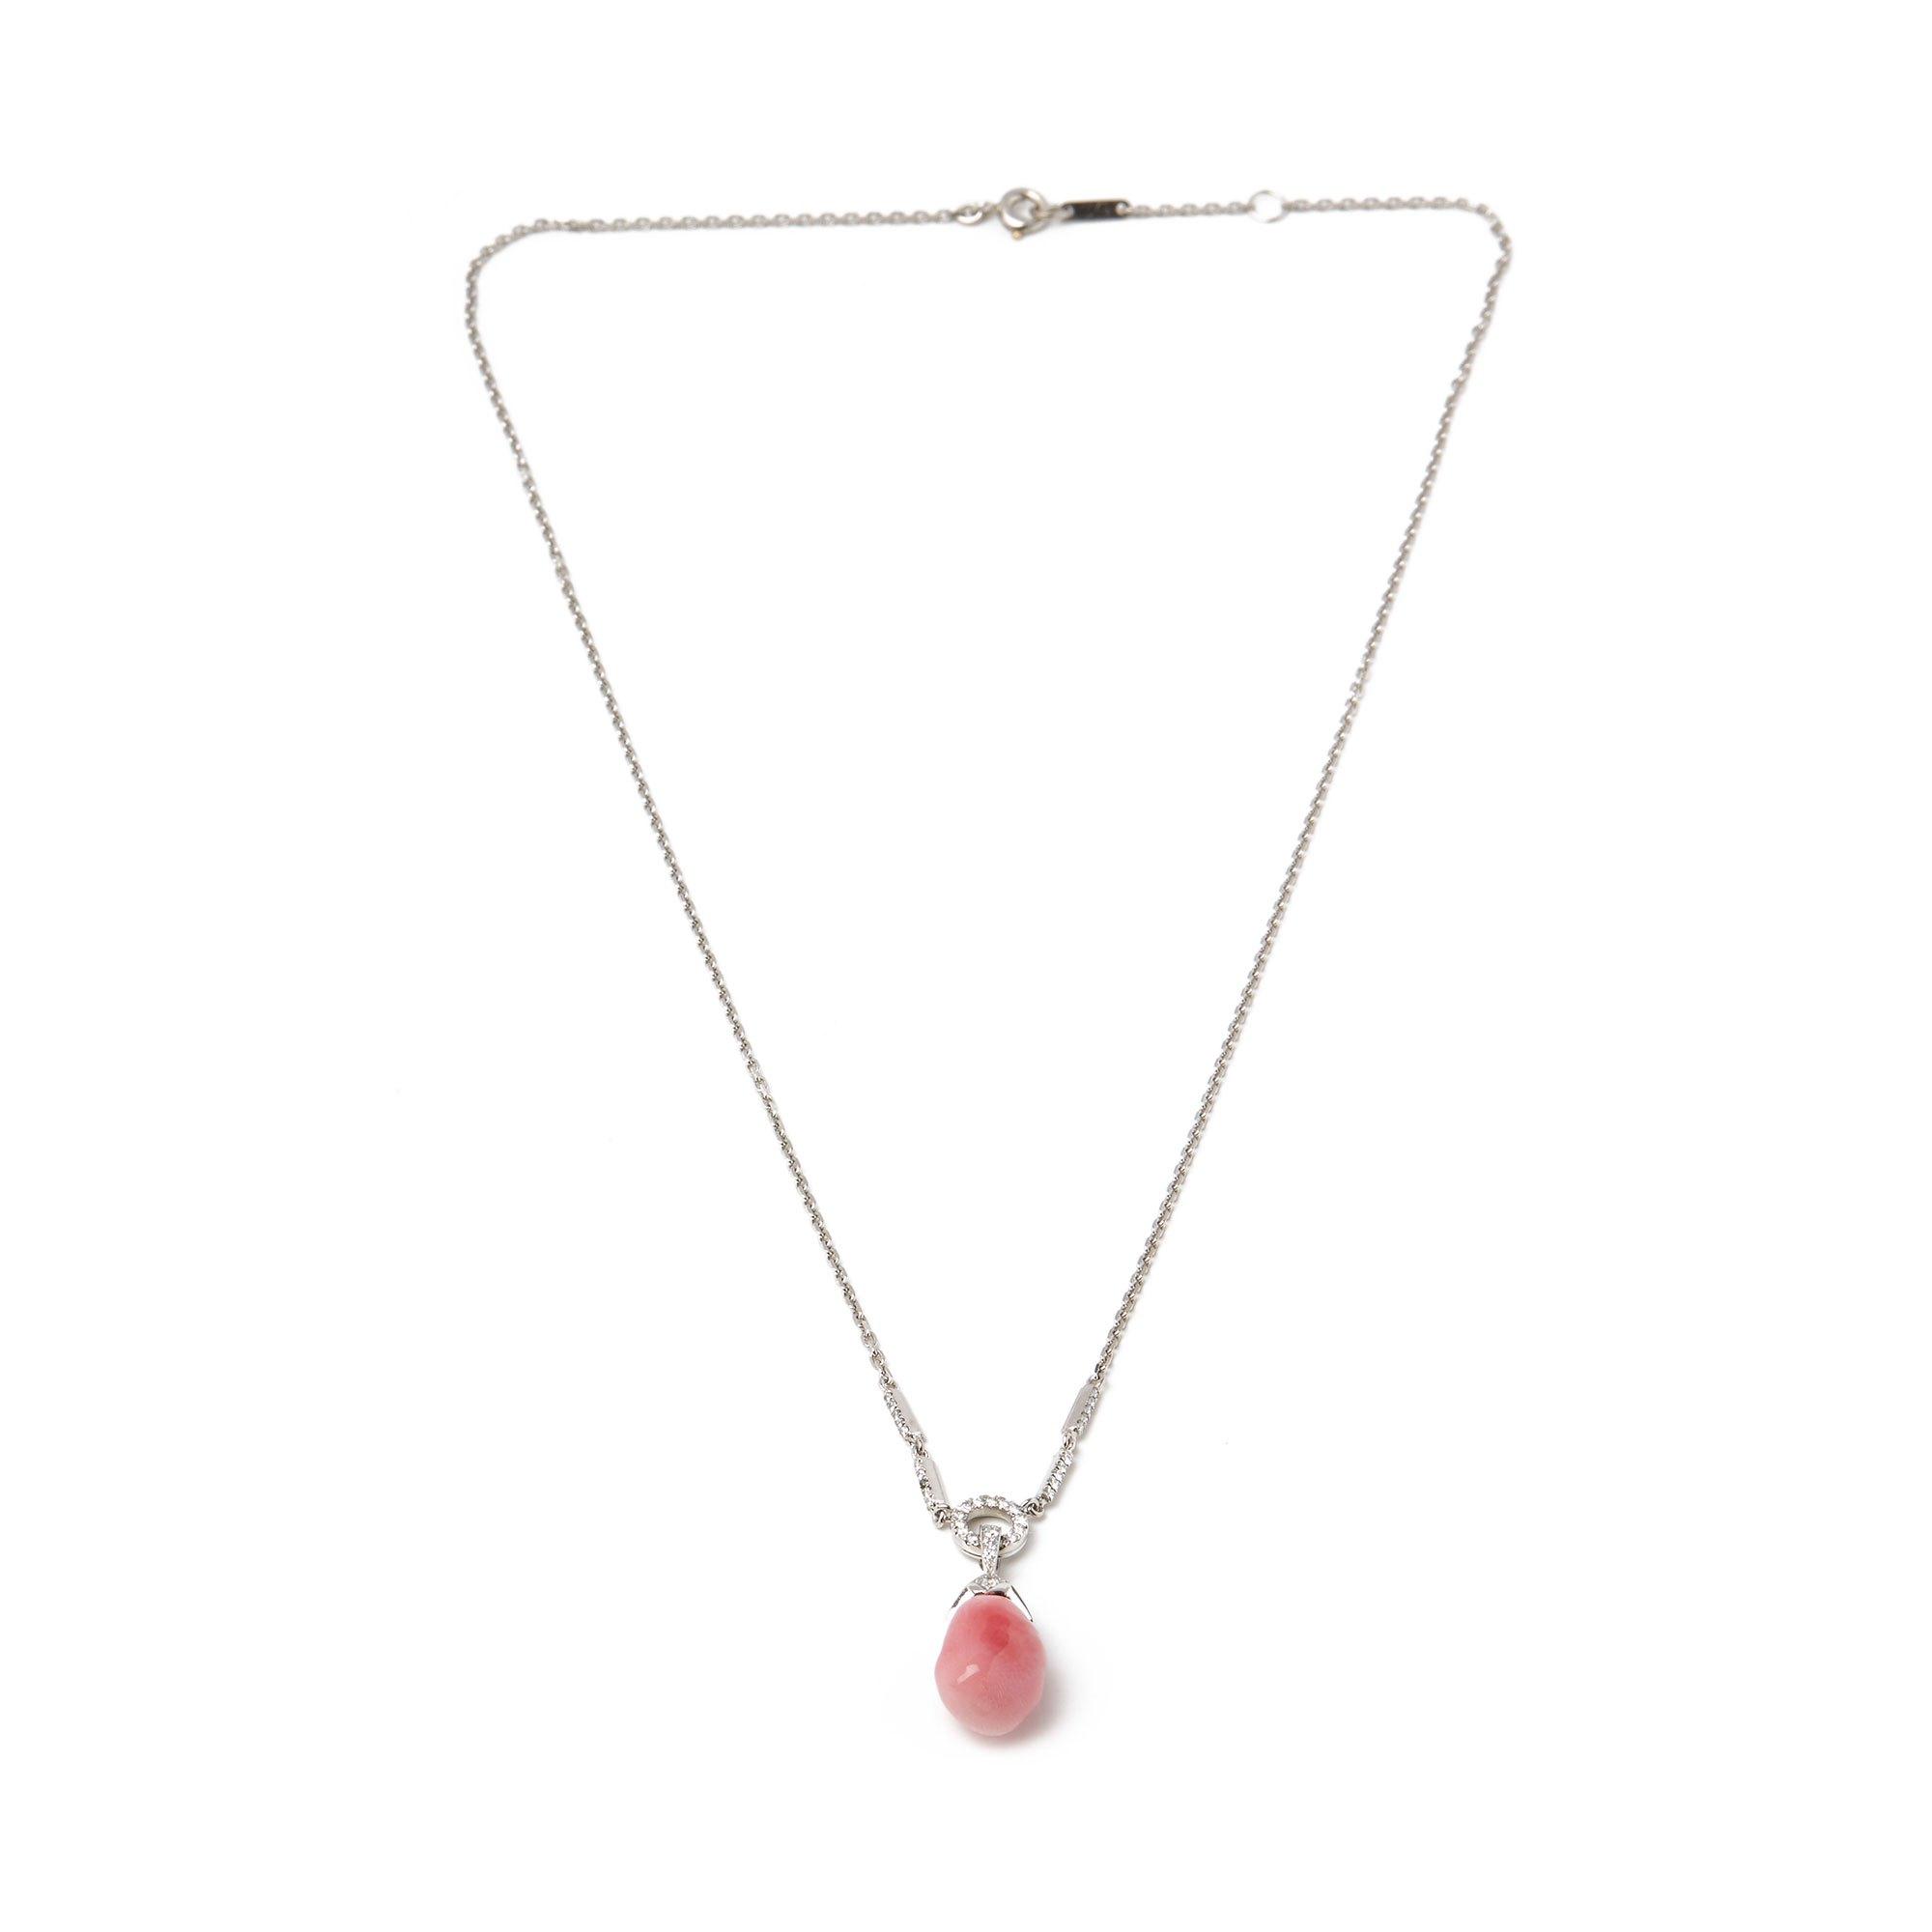 David Morris 6.9ct Conch Pearl and Diamond Platinum Pendant